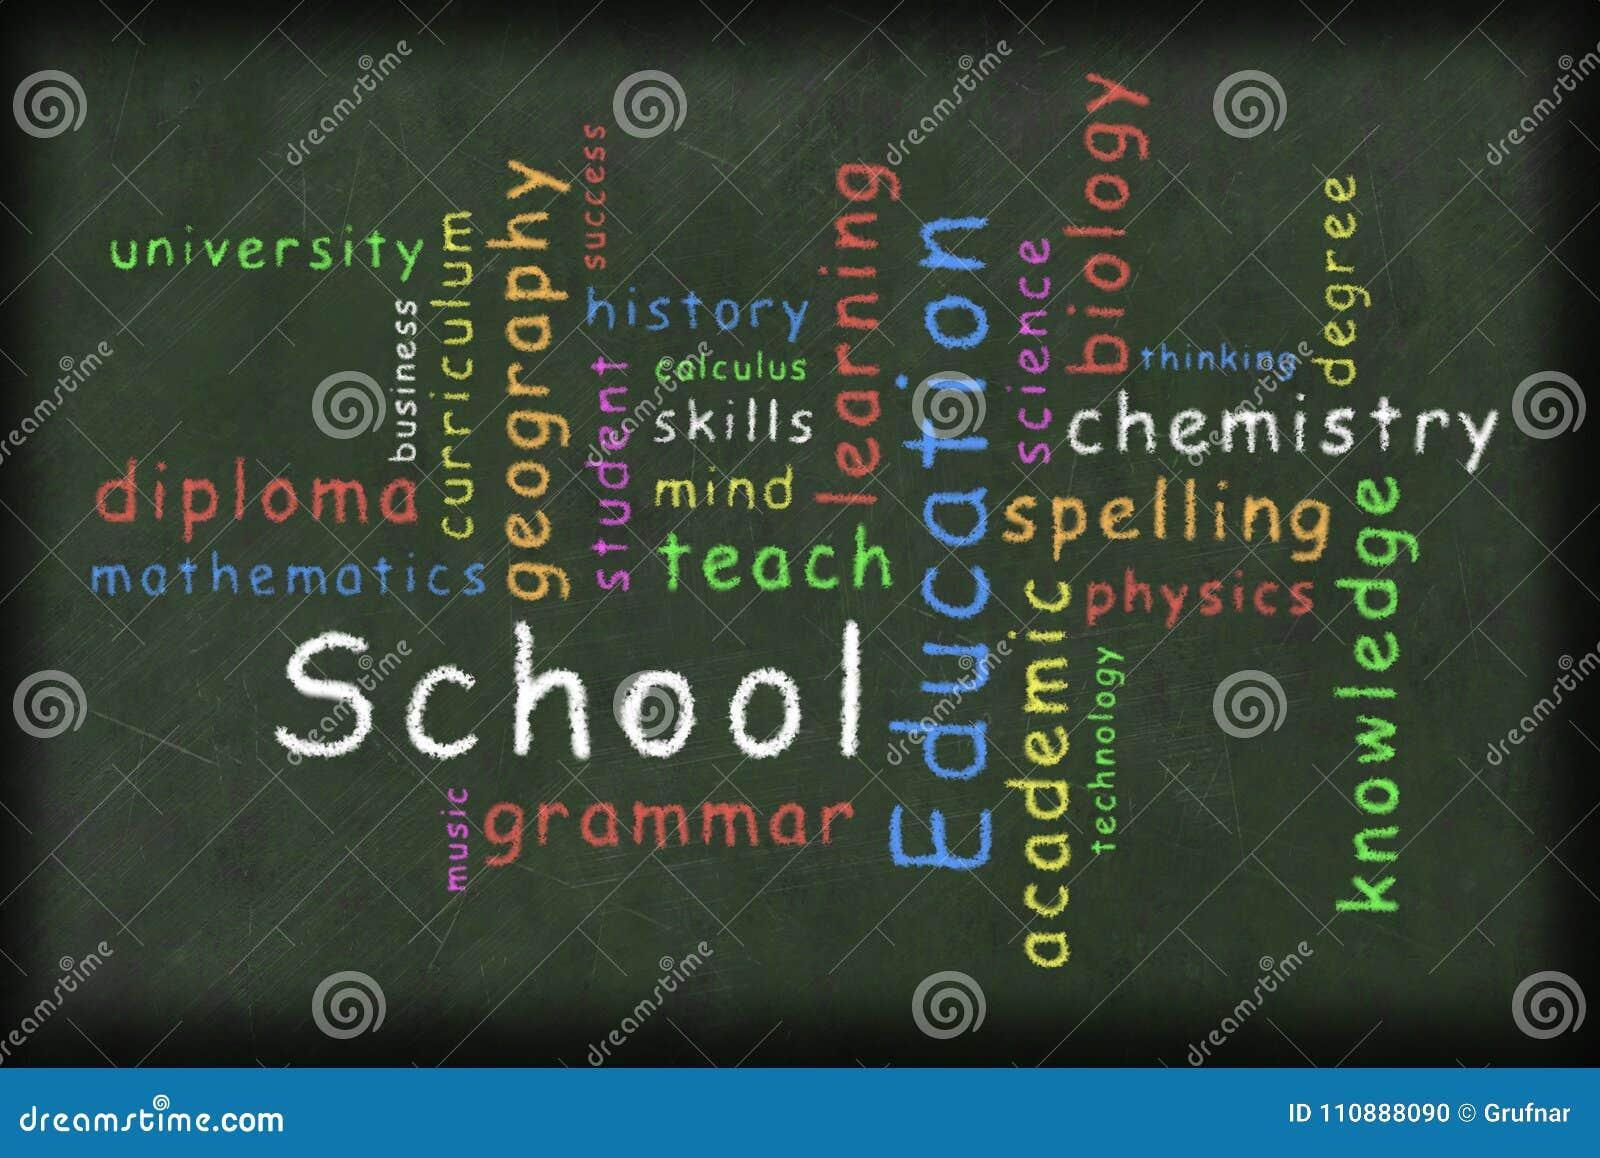 education related word cloud illustration stock illustration